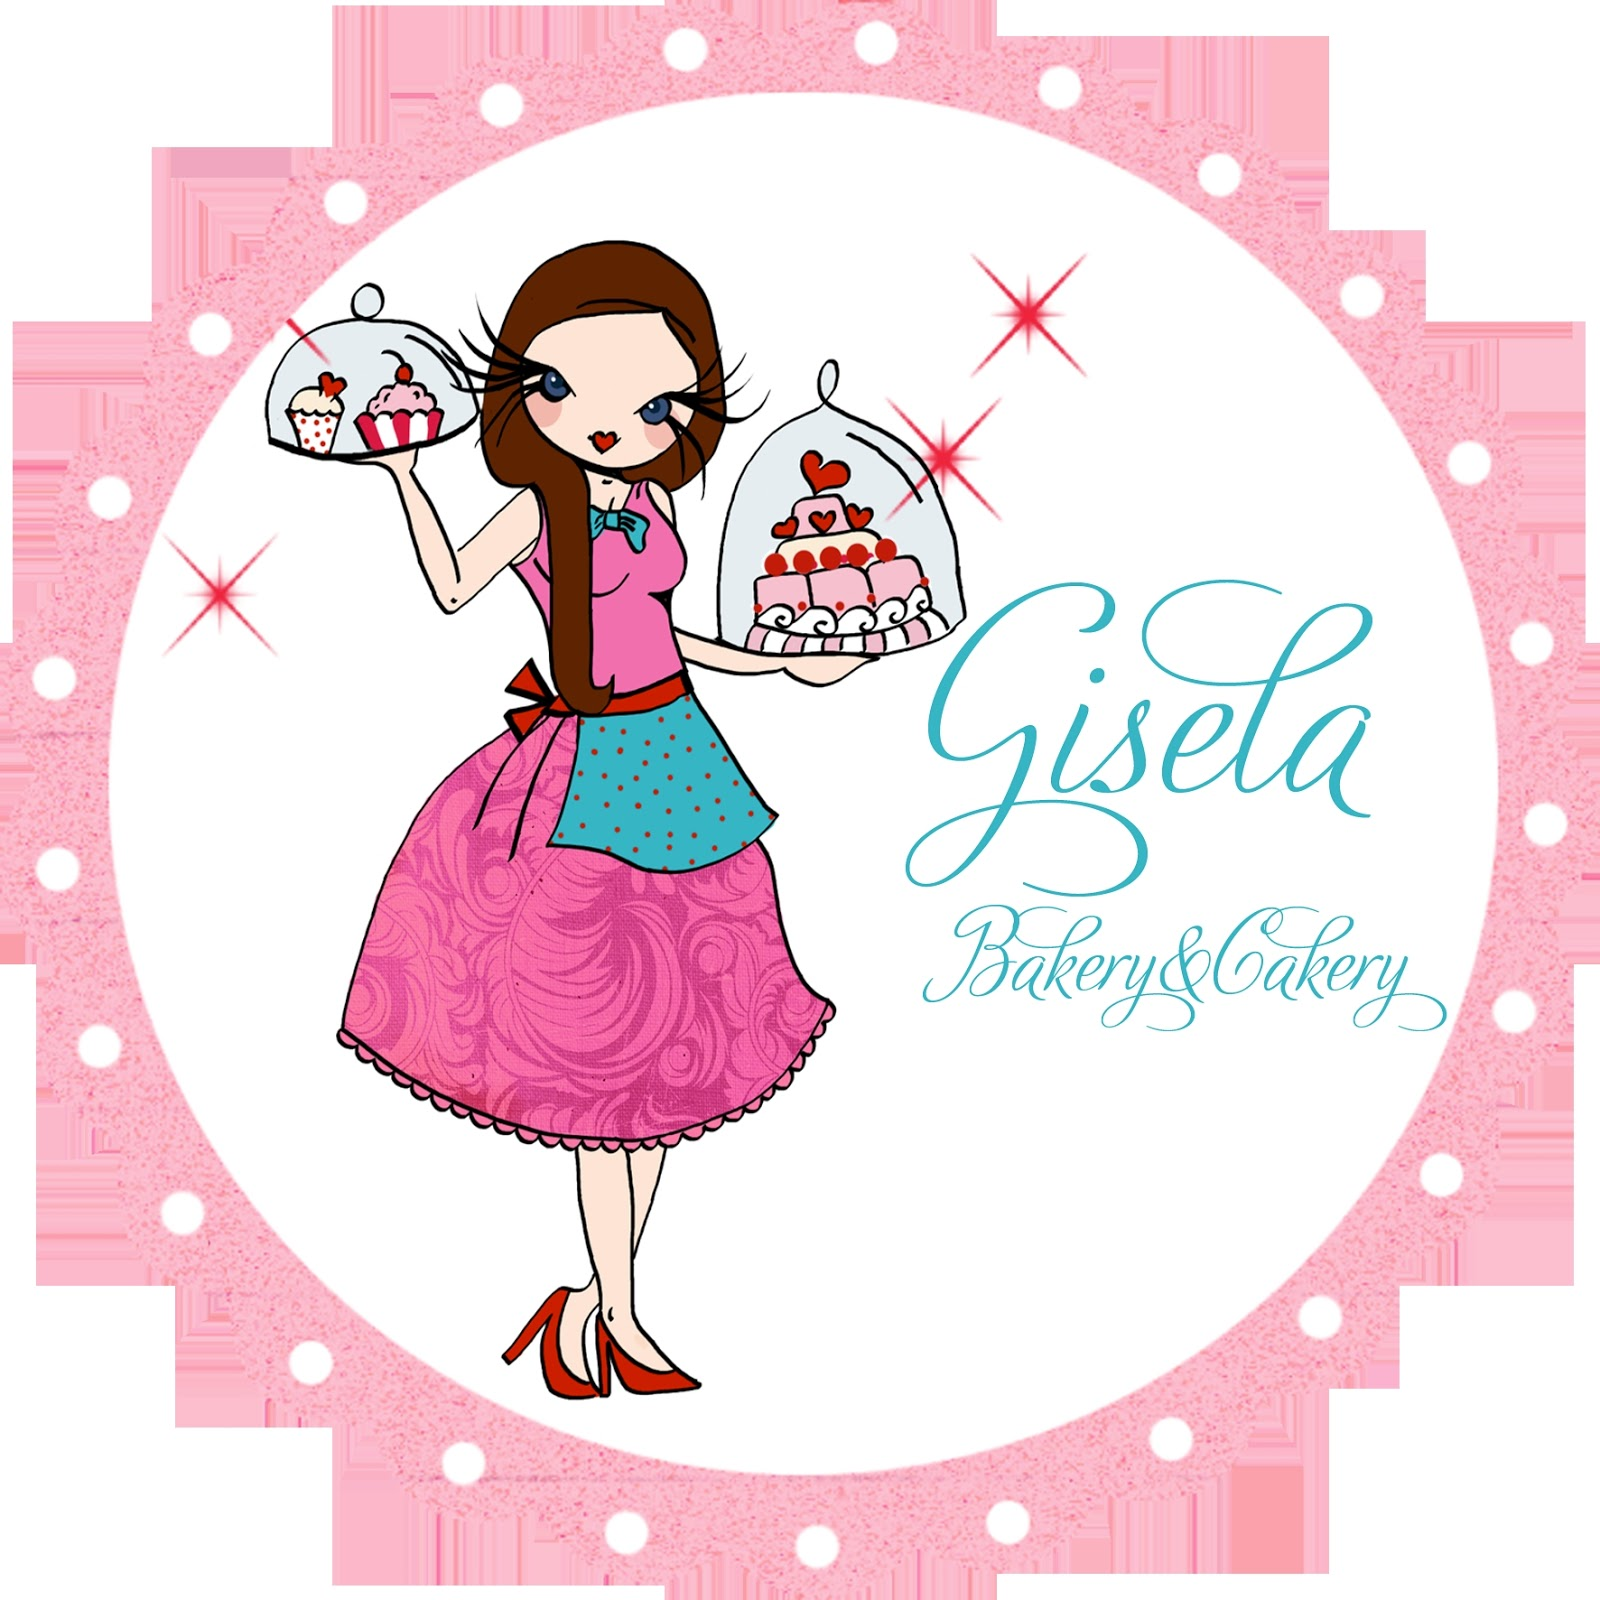 Gisela bakery cakery mensajeras del bienestar bierzo for Logos para editar